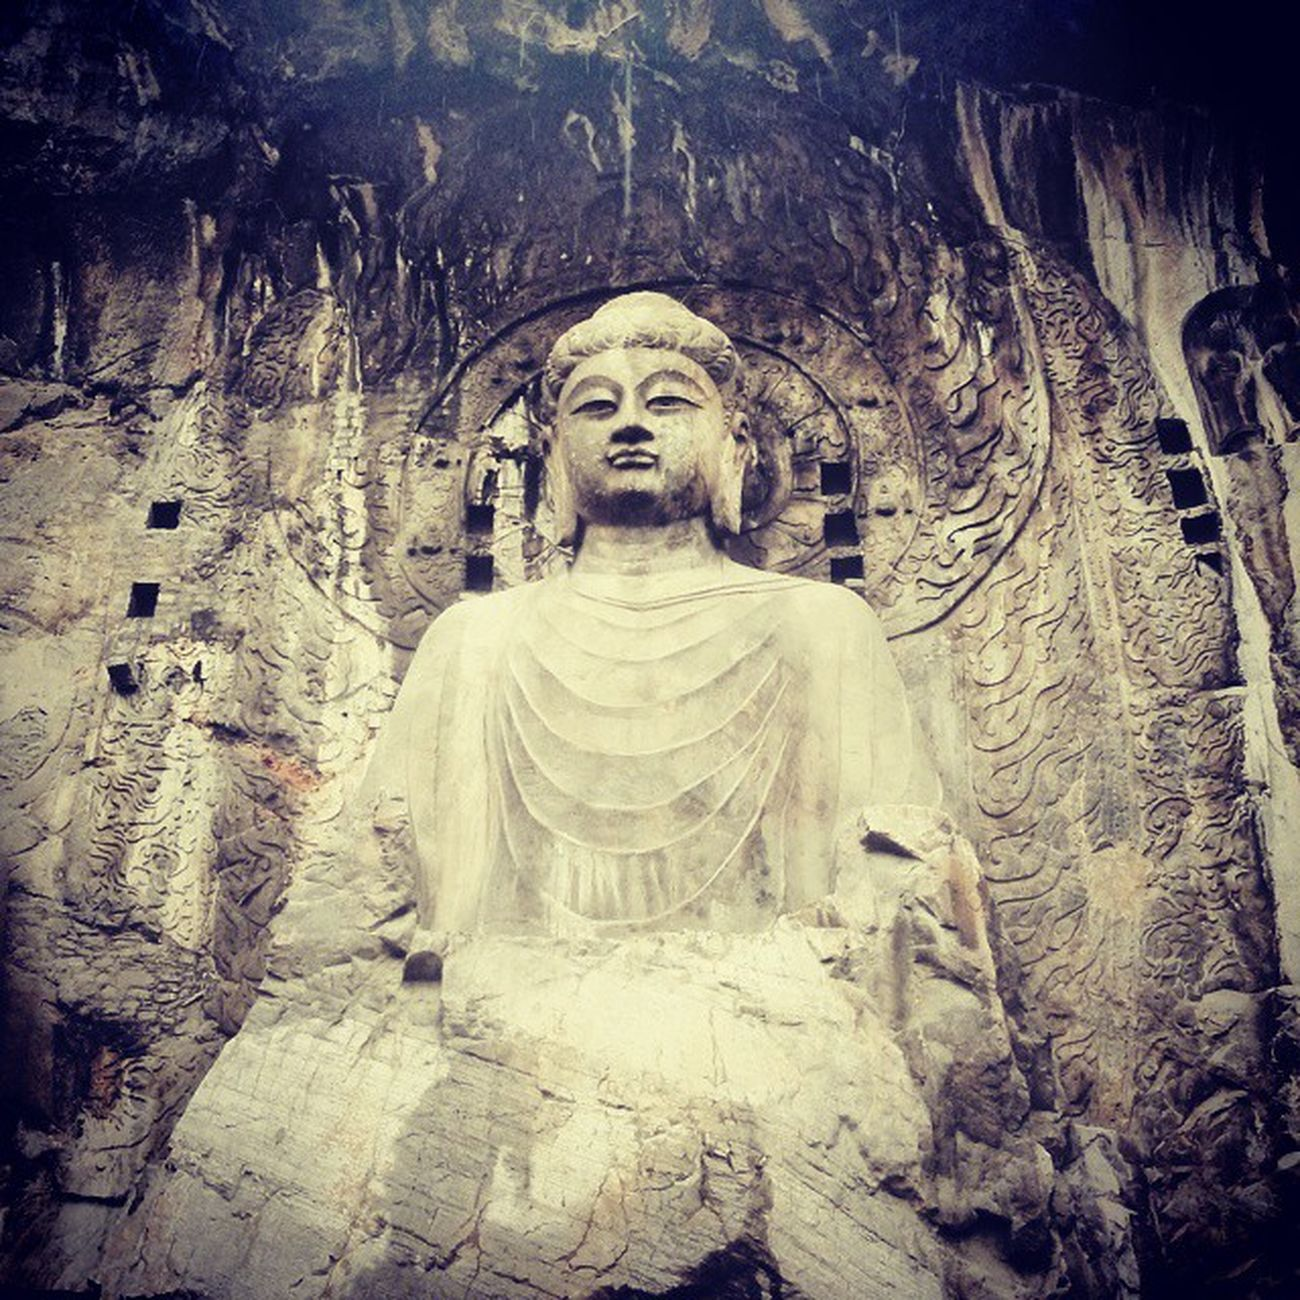 Luoyang - grotte di Longmen Arte buddhista in Cina, Grande Vairochana 洛阳 龙门石窟 佛教 Buddhism Art Vairochana